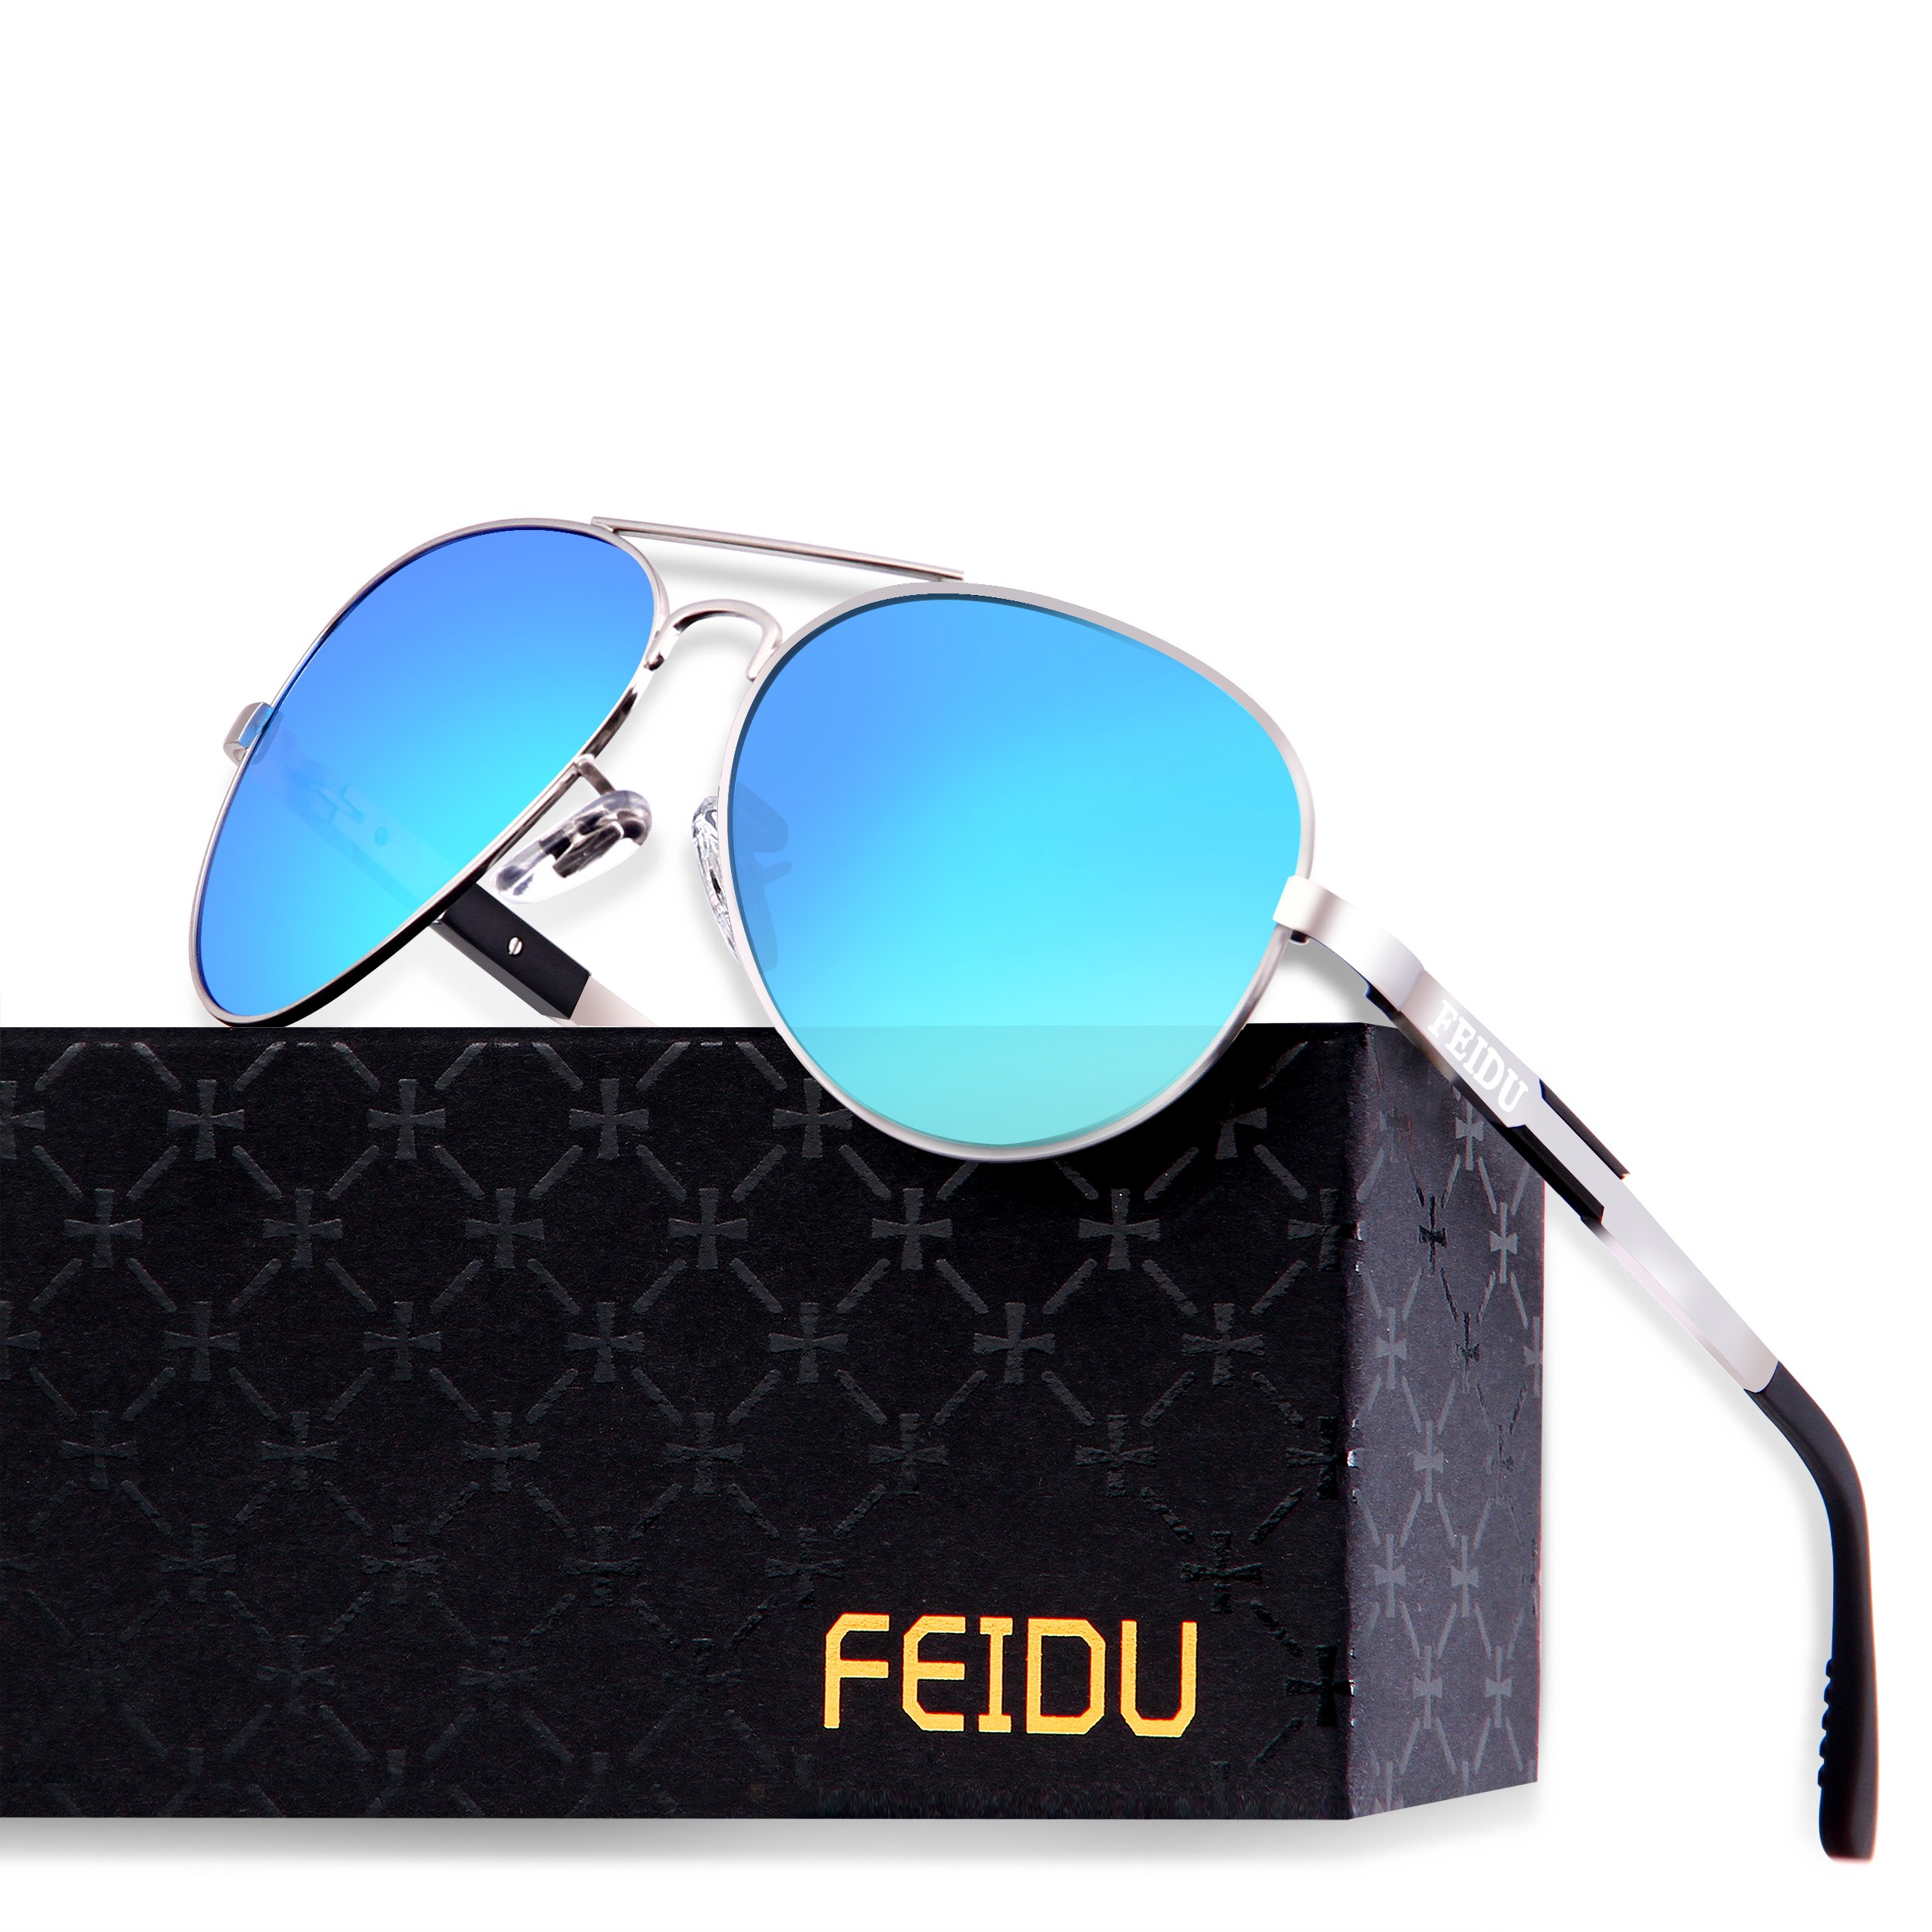 Polarized Aviator Sunglasses for Men - FEIDU Driving Sunglasses Unisex FD9001 (B-Blue/Silver, 2.28) by FEIDU